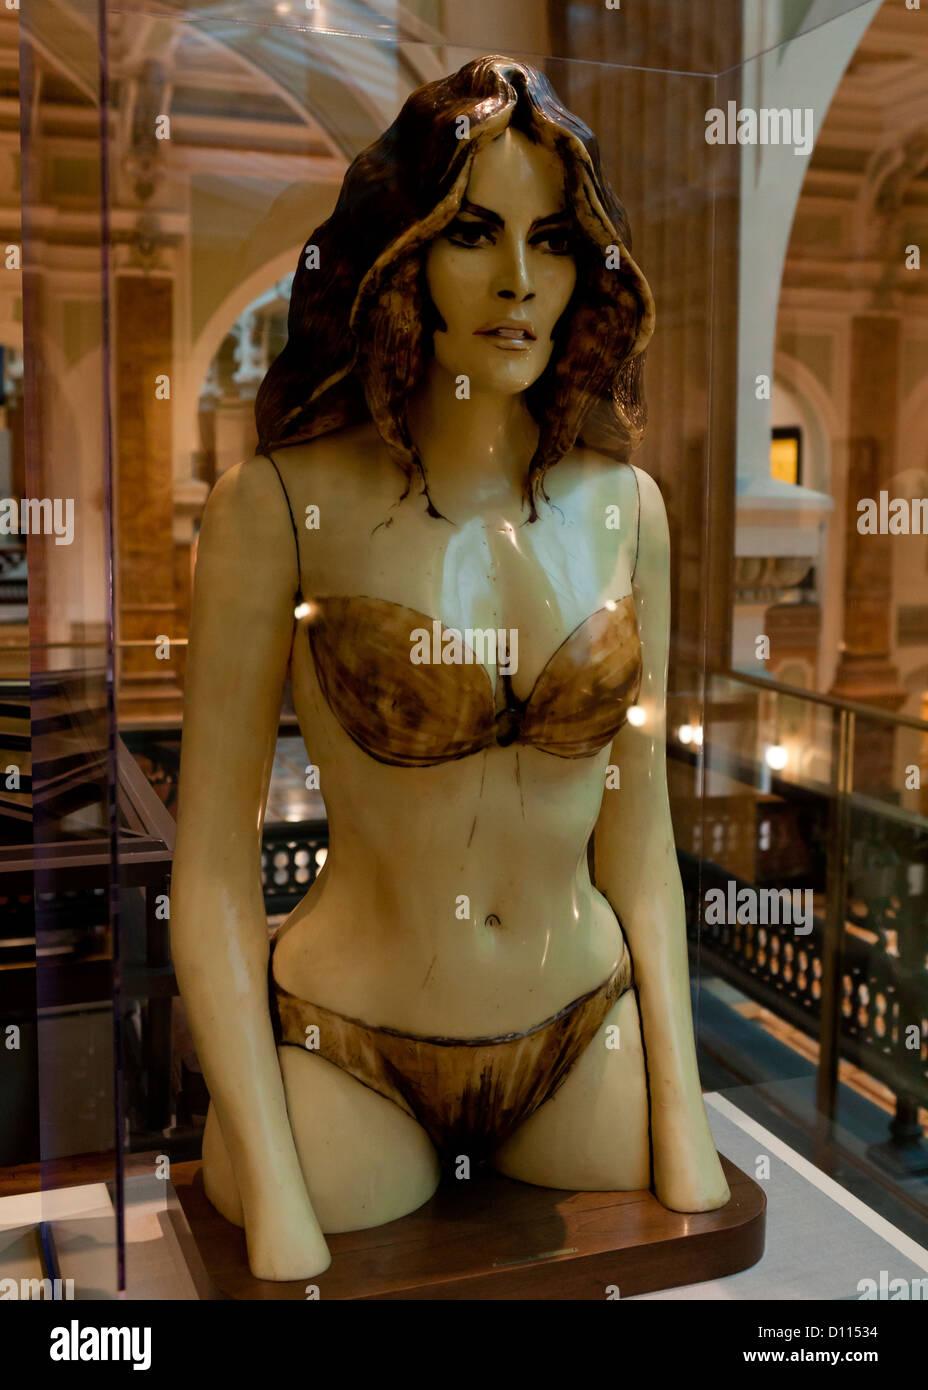 Rachel stevens nude pics magic porn movie